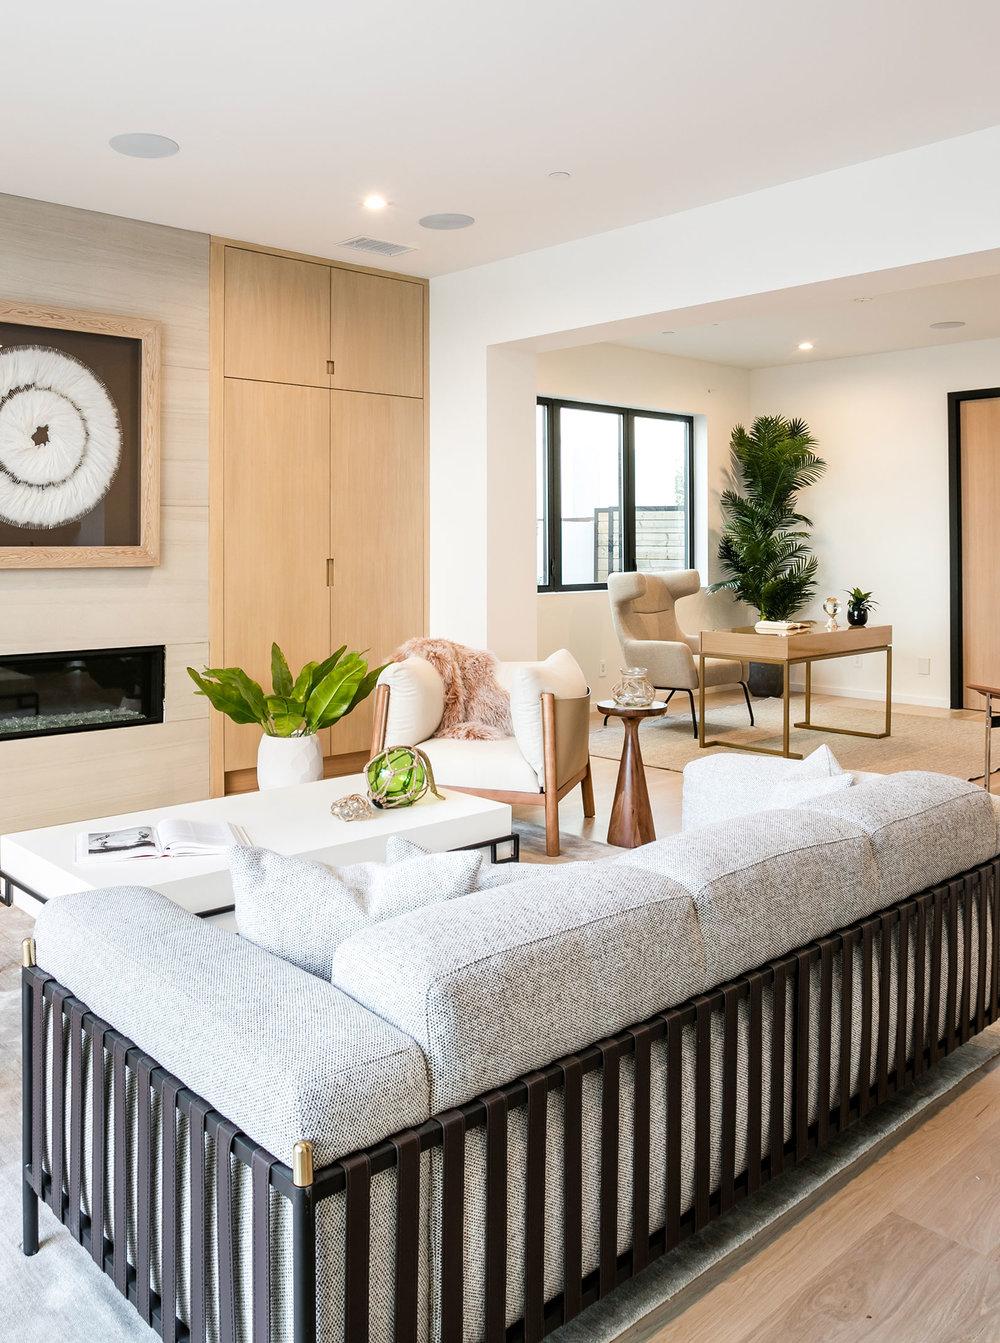 4-Silicon-Bay-modern-open-concept-living-room-home-office.jpg